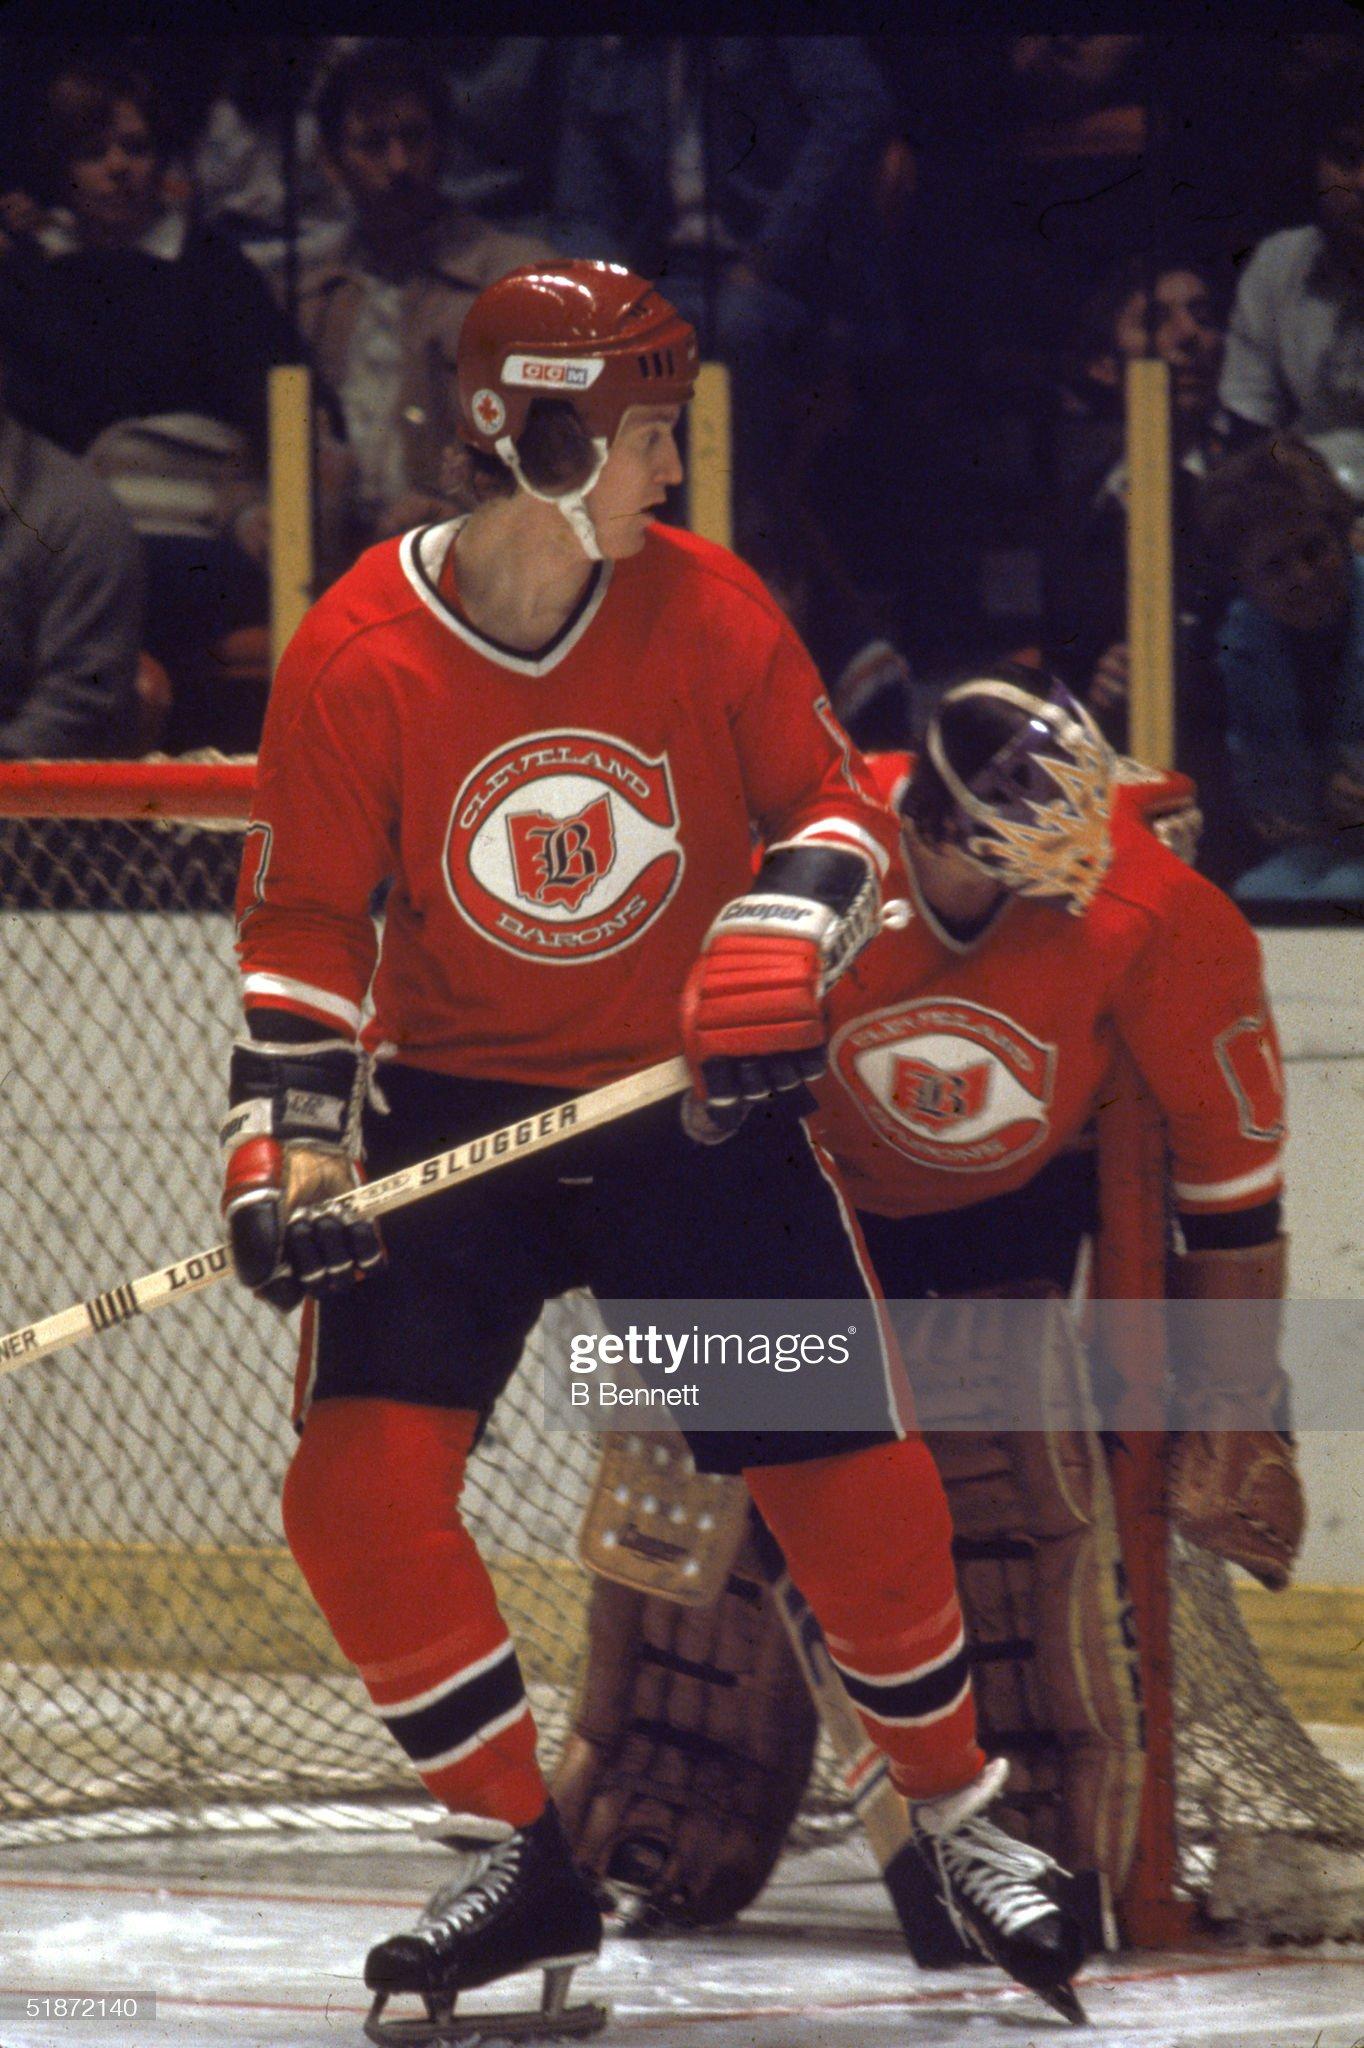 canadian-professional-ice-hockey-playerd